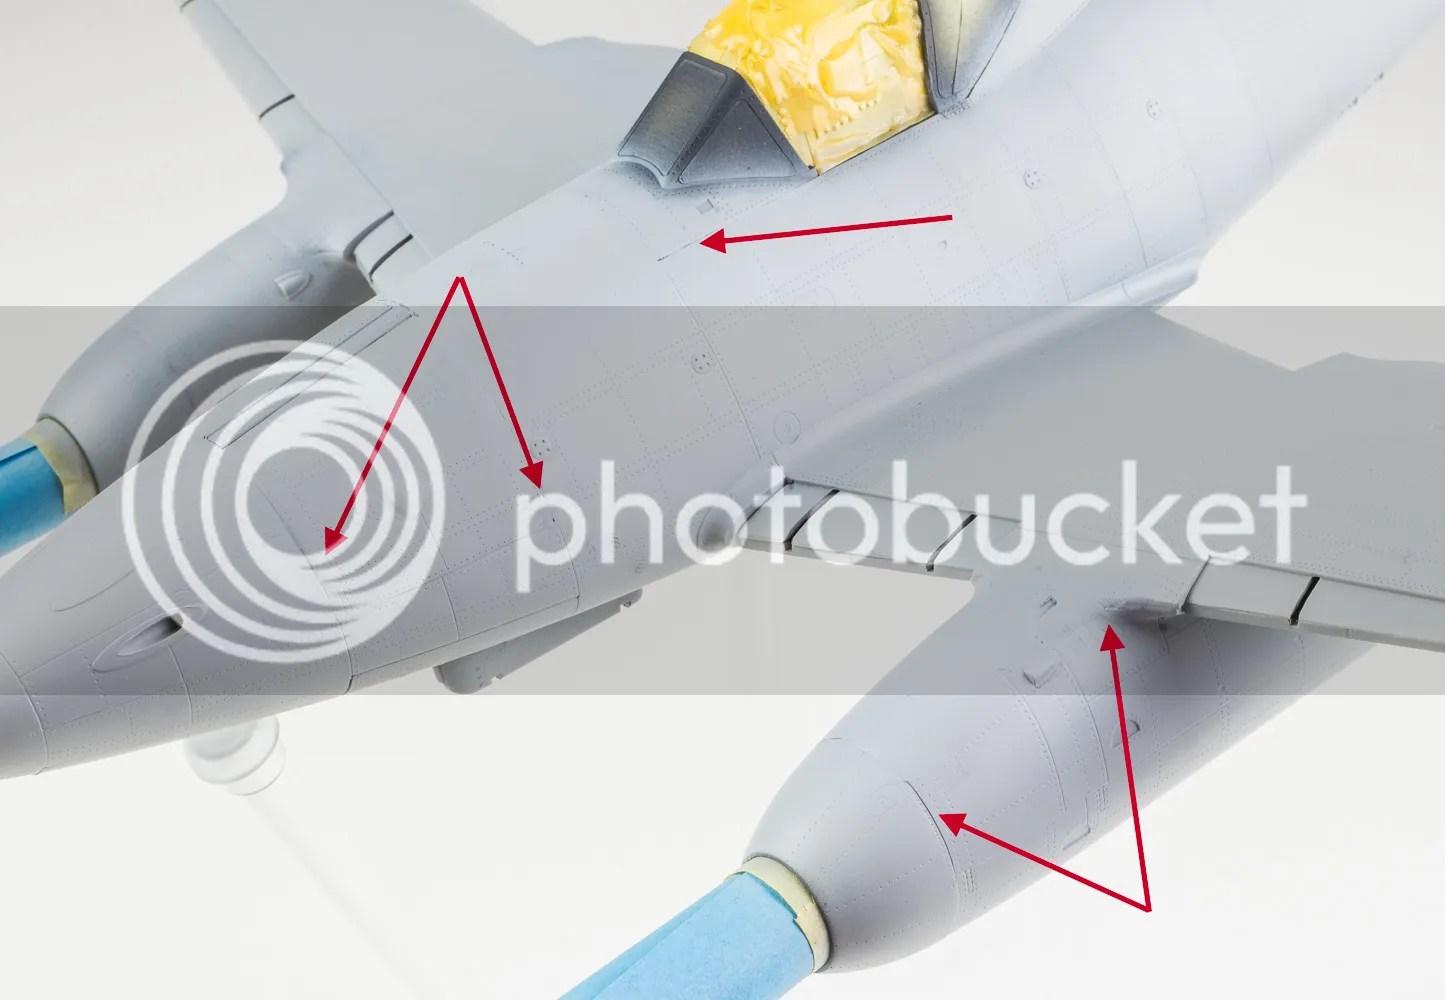 01_11_14 Me 262A-2a-6-Edit photo 01_11_14Me262A-2a-6-Edit_zps3b59b12f.jpg